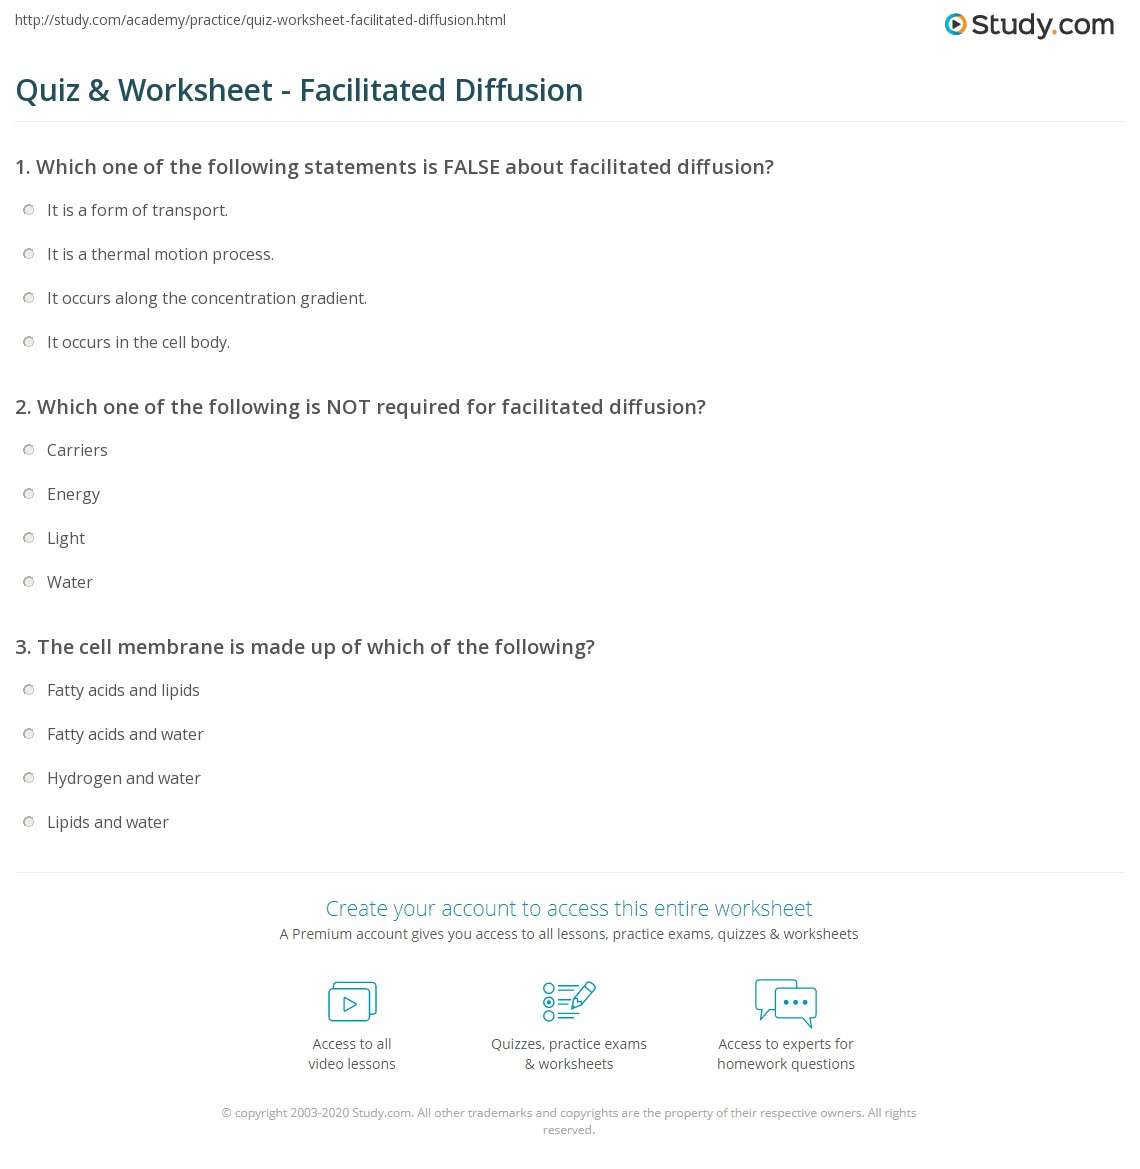 Quiz & Worksheet - Facilitated Diffusion | Study.com